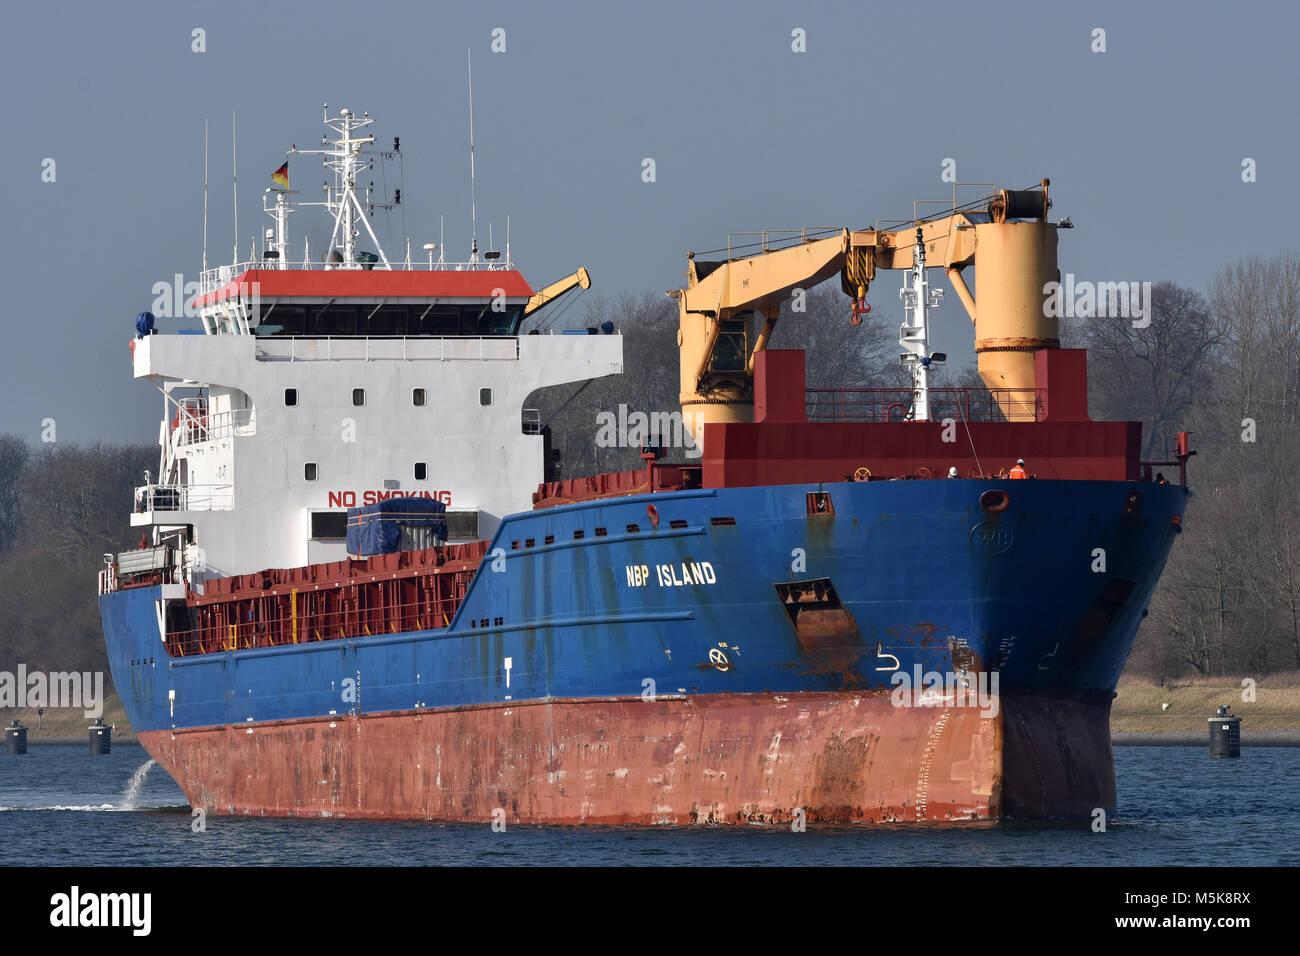 NBP Island - Stock Image